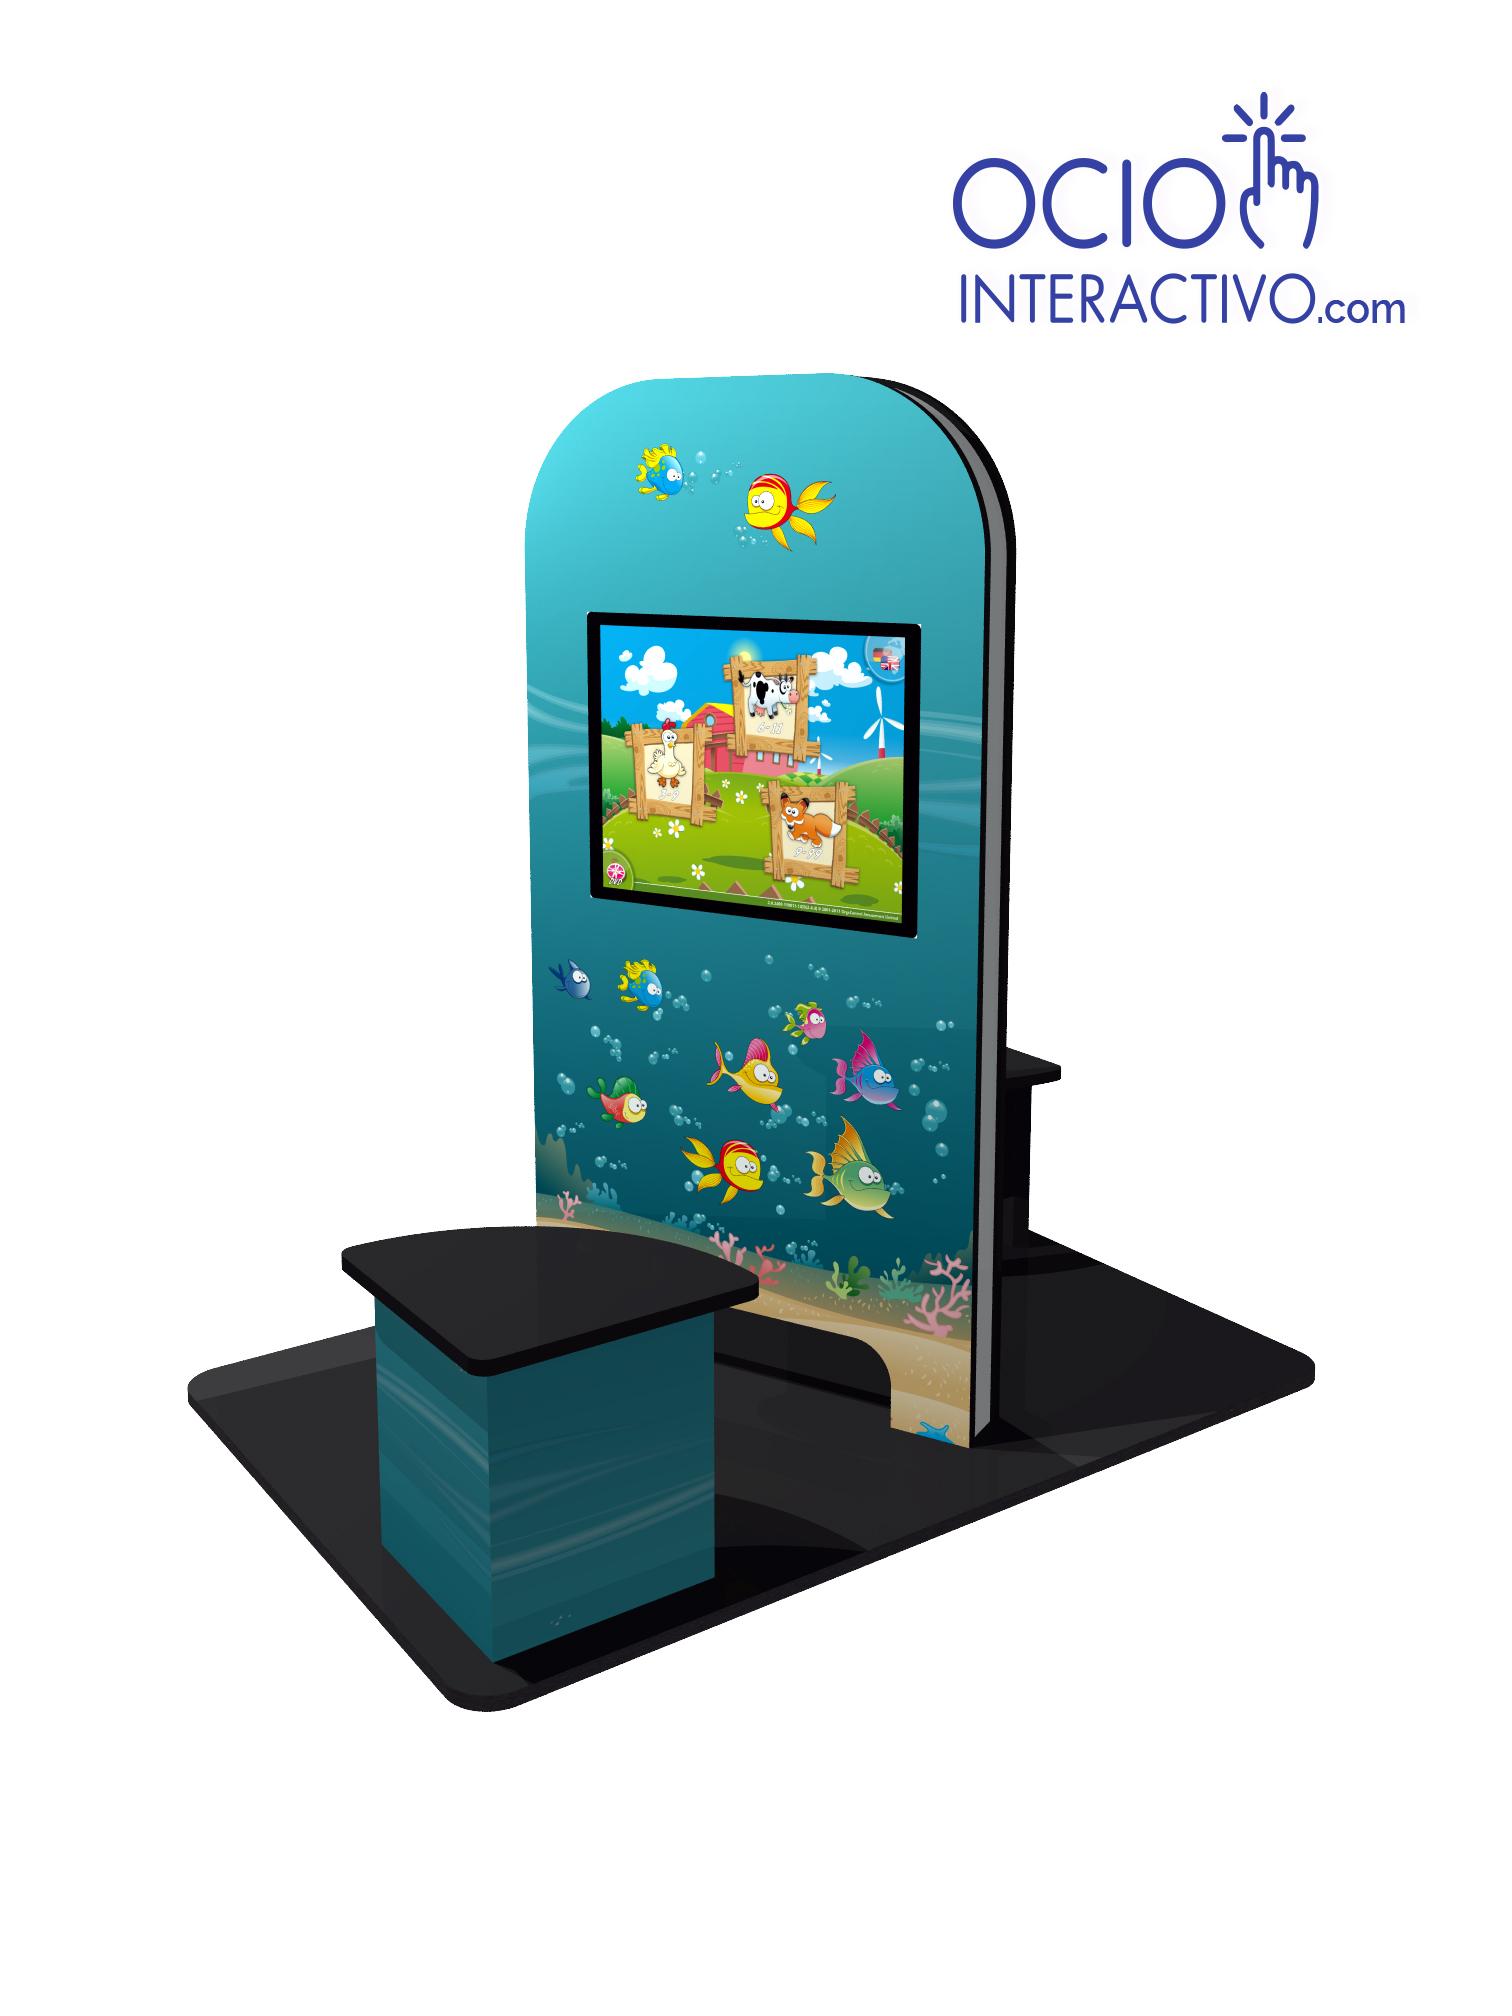 https://parquedebolas.com/images/productos/peq/kids%20corner%20mar%20asiento%20doble.jpg